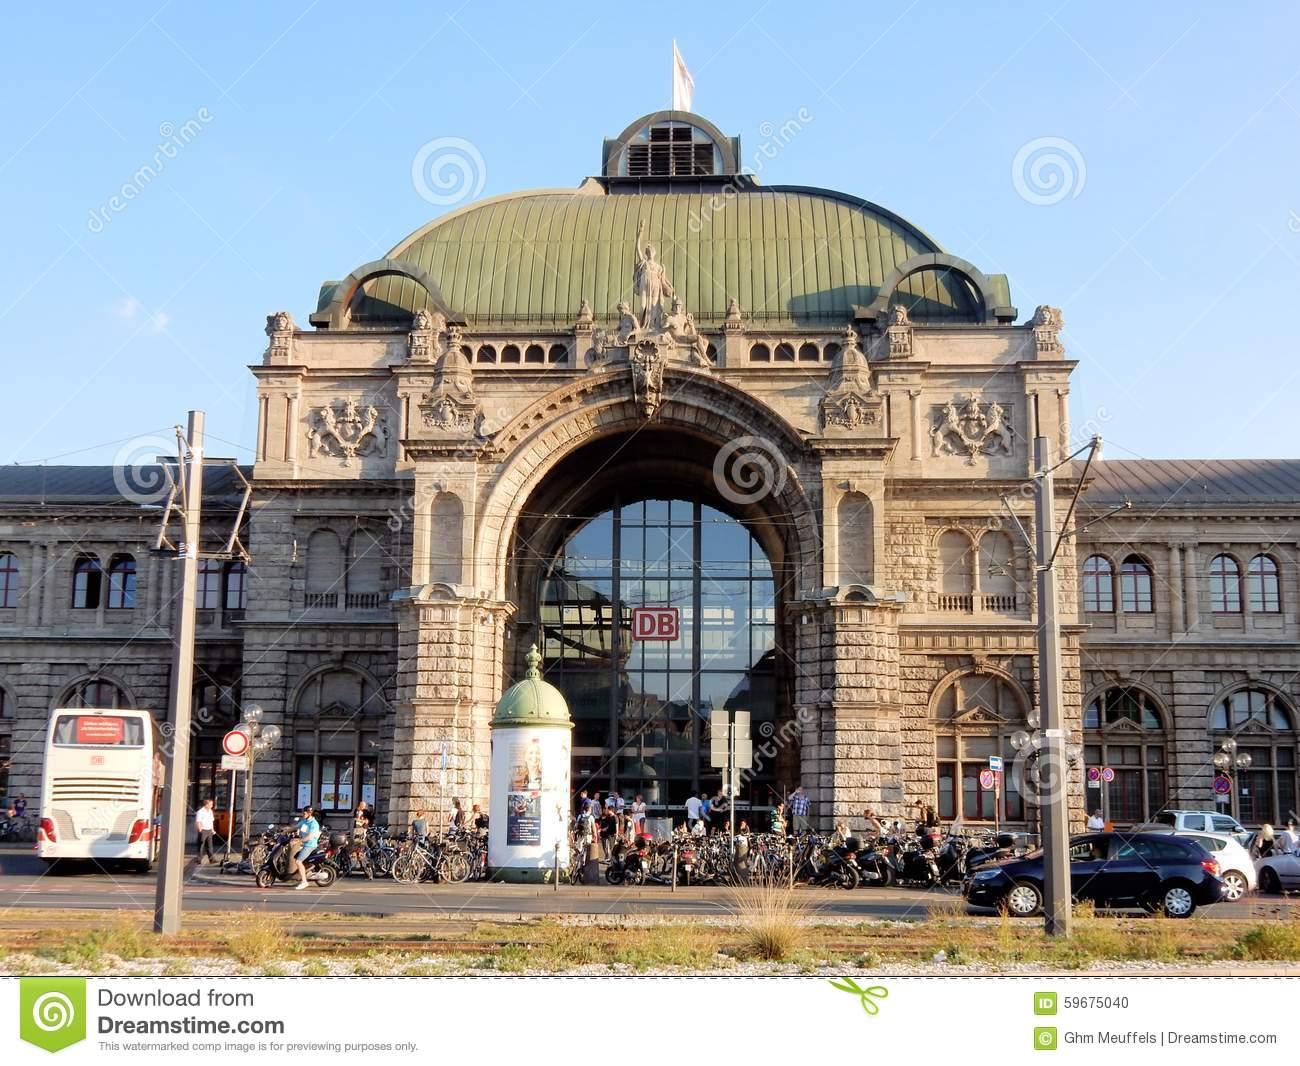 Nuremberg Central Railway Station Façade In Neo.